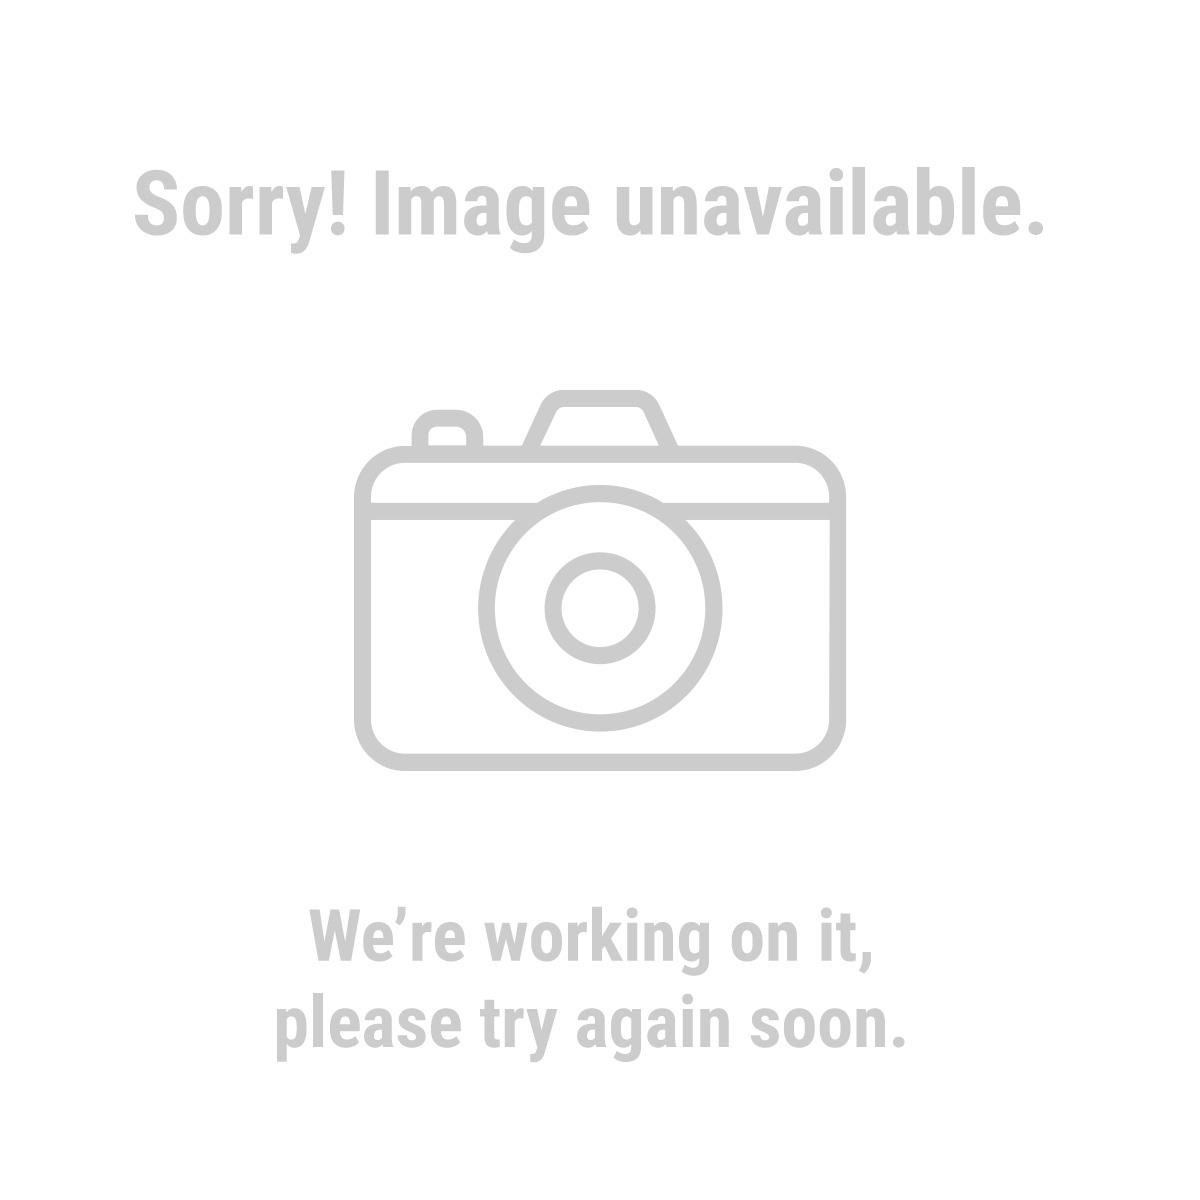 HFT 60268 50 ft. x 14 Gauge Green Outdoor Extension Cord